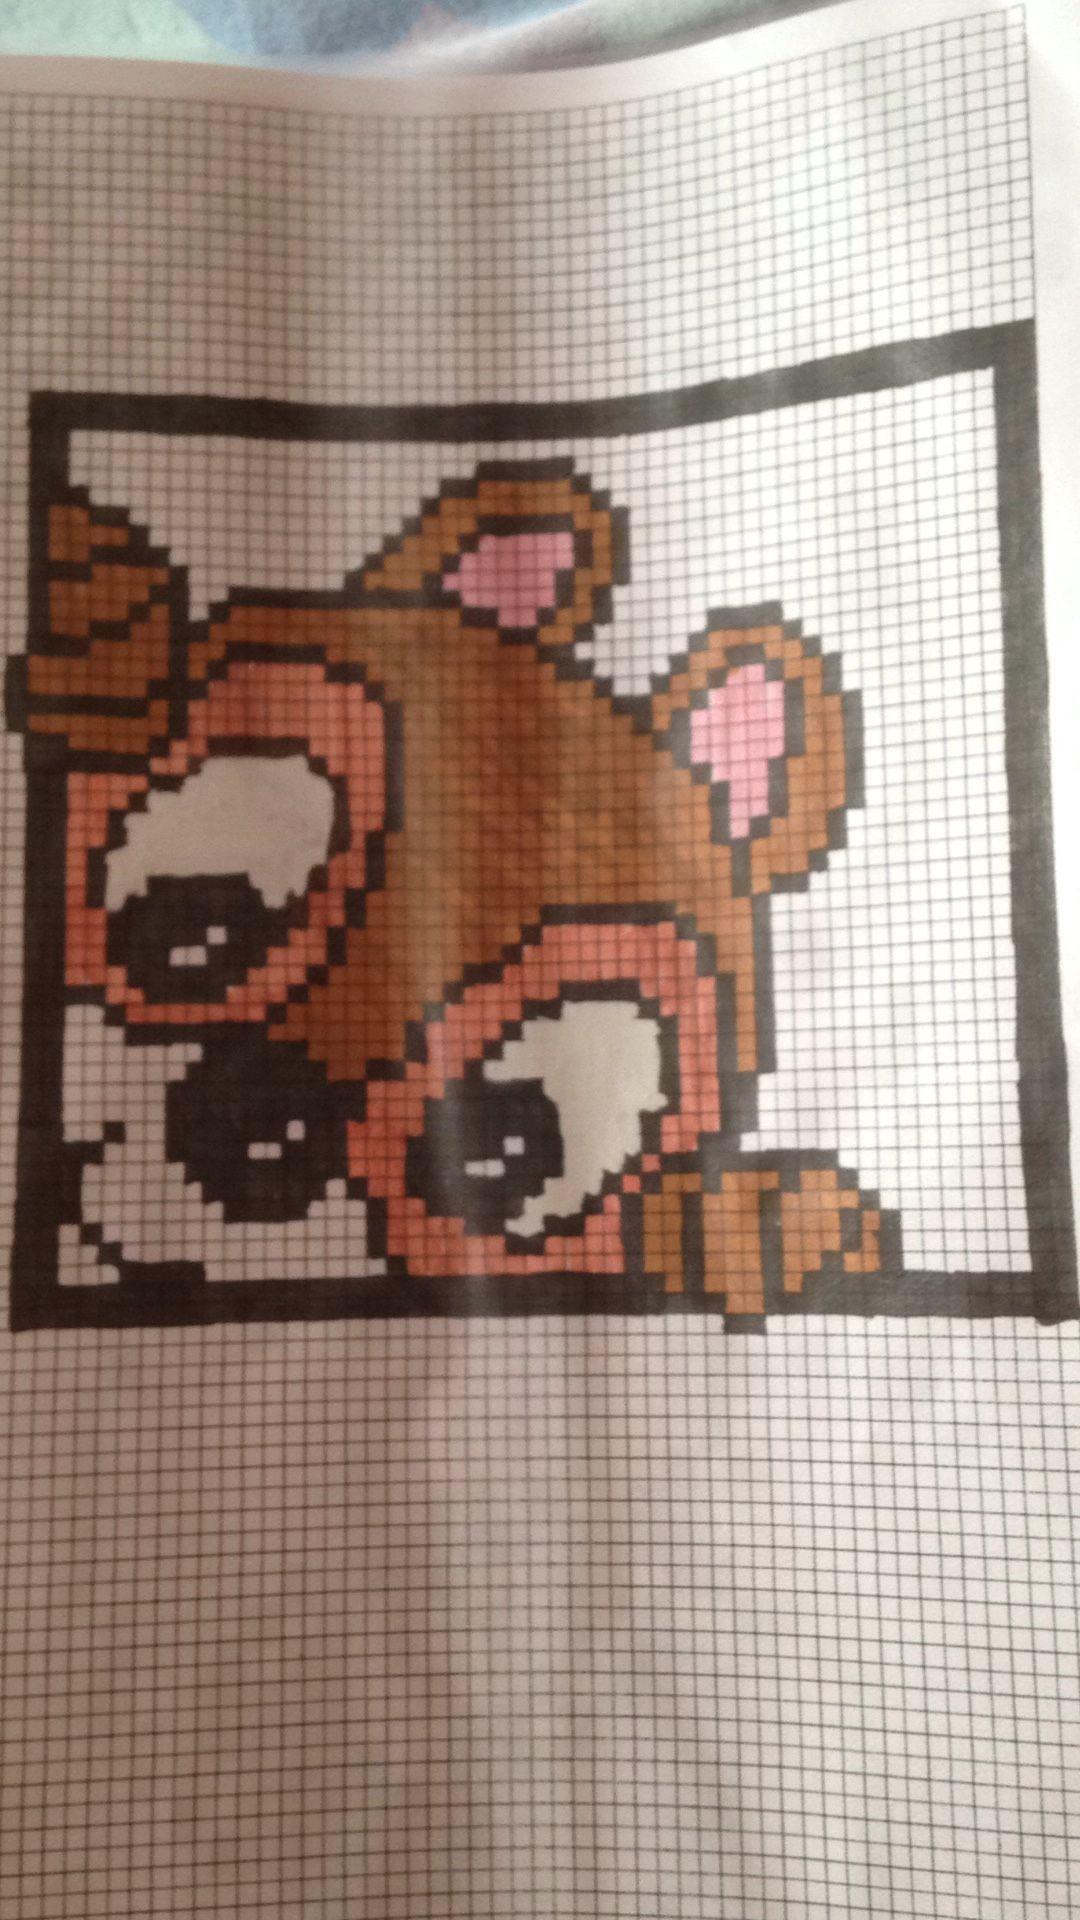 Epingle Par Bella Sur Mes Pixels Arts Dessin Petit Carreau Dessin Pixel Stich Dessin